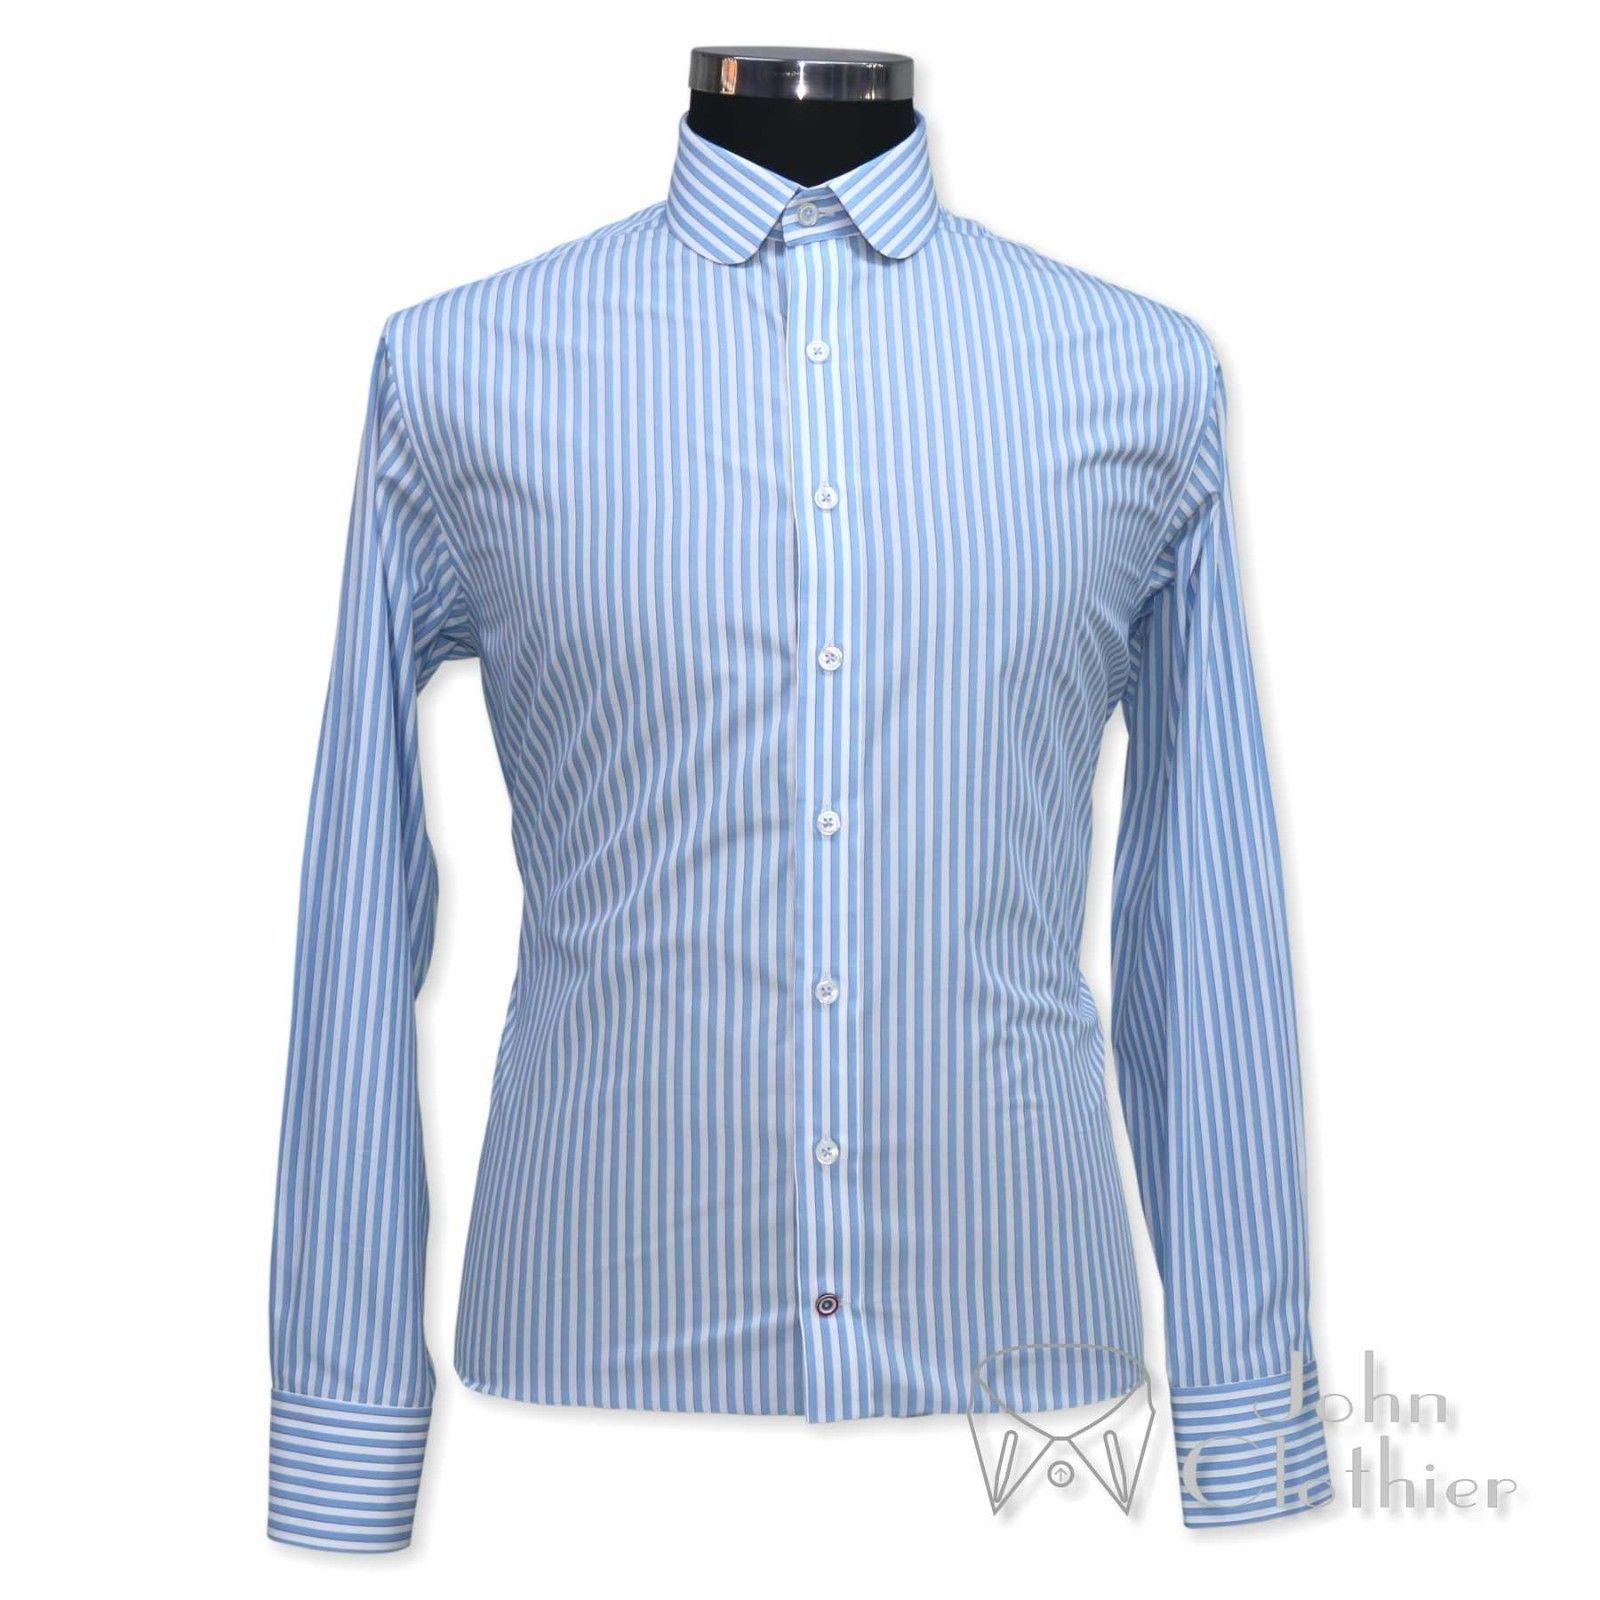 Mens Penny collar Cotton shirt Bankers Sky Blue White stripes Gents Club Round wtbcXK5zT